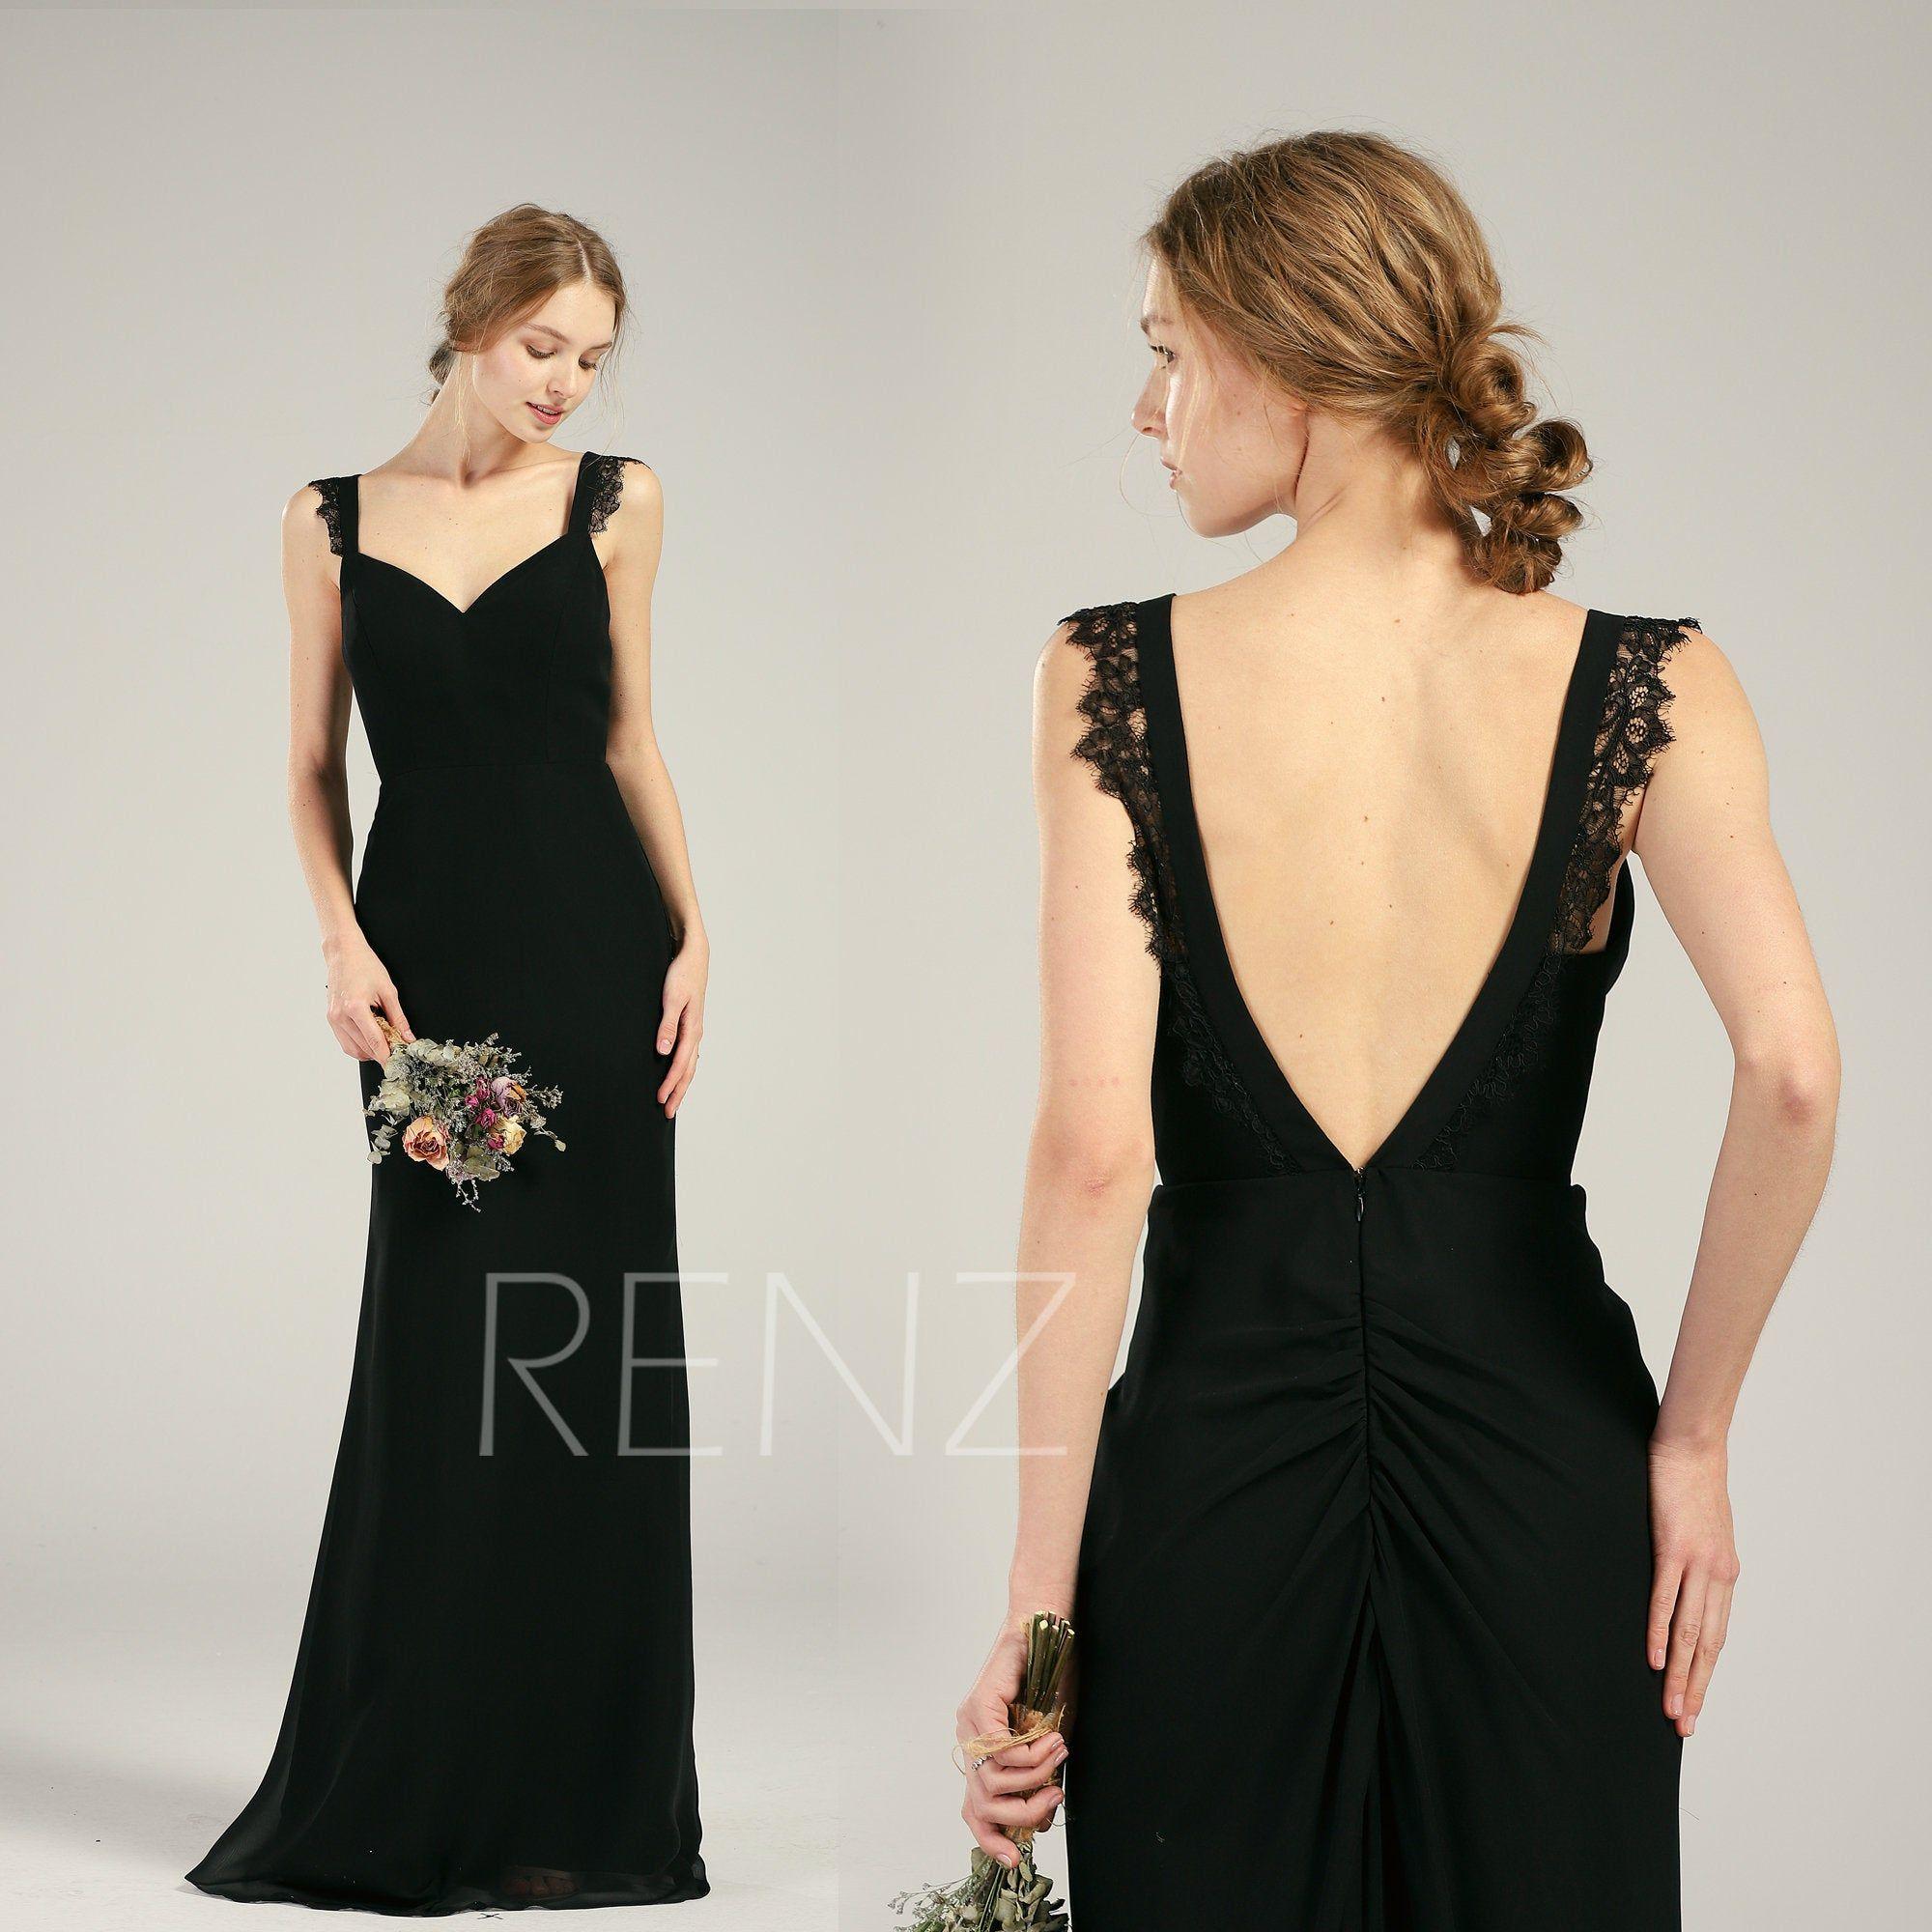 Bridesmaid Dress Black Chiffon Wedding Dress Train Deep V Back Fitted Prom Dress Lace Straps Maxi Dress In 2020 Dress Train Black Bridesmaid Dresses Prom Dresses Lace